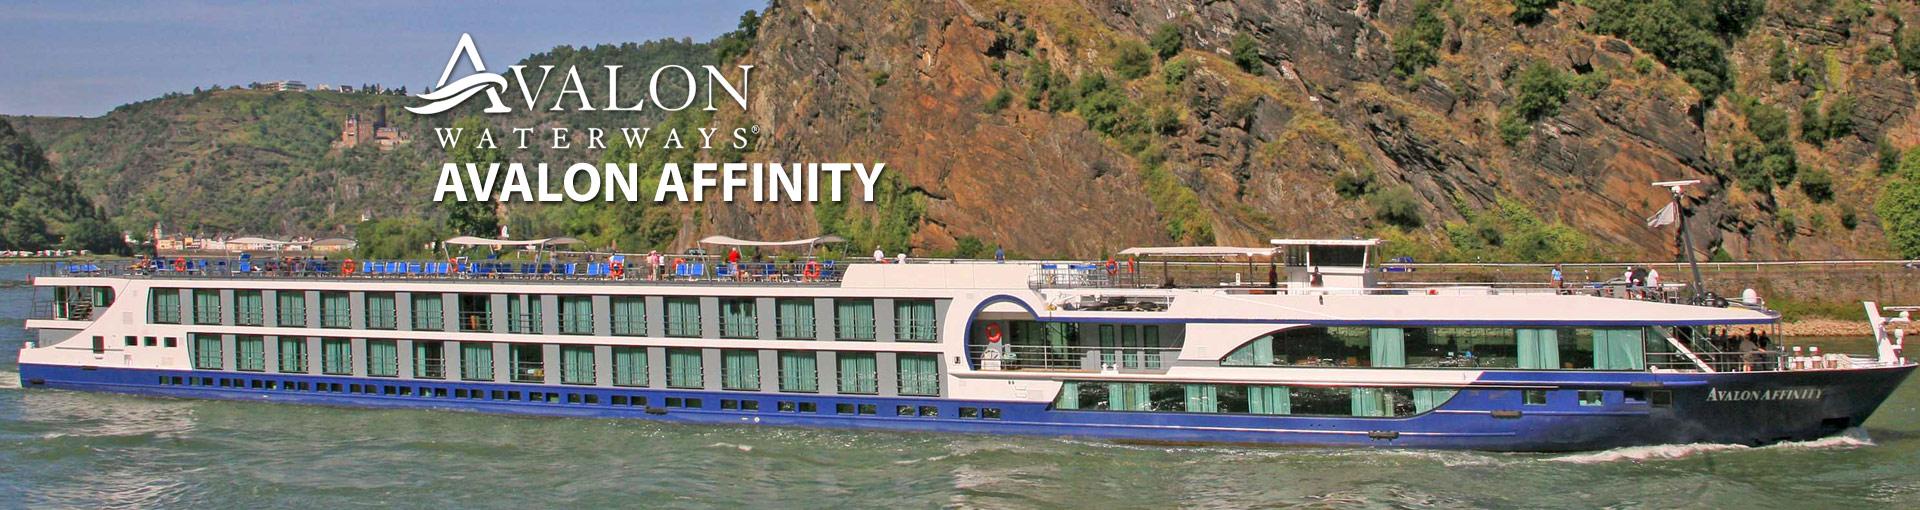 Avalon Waterways Affinity river cruise ship